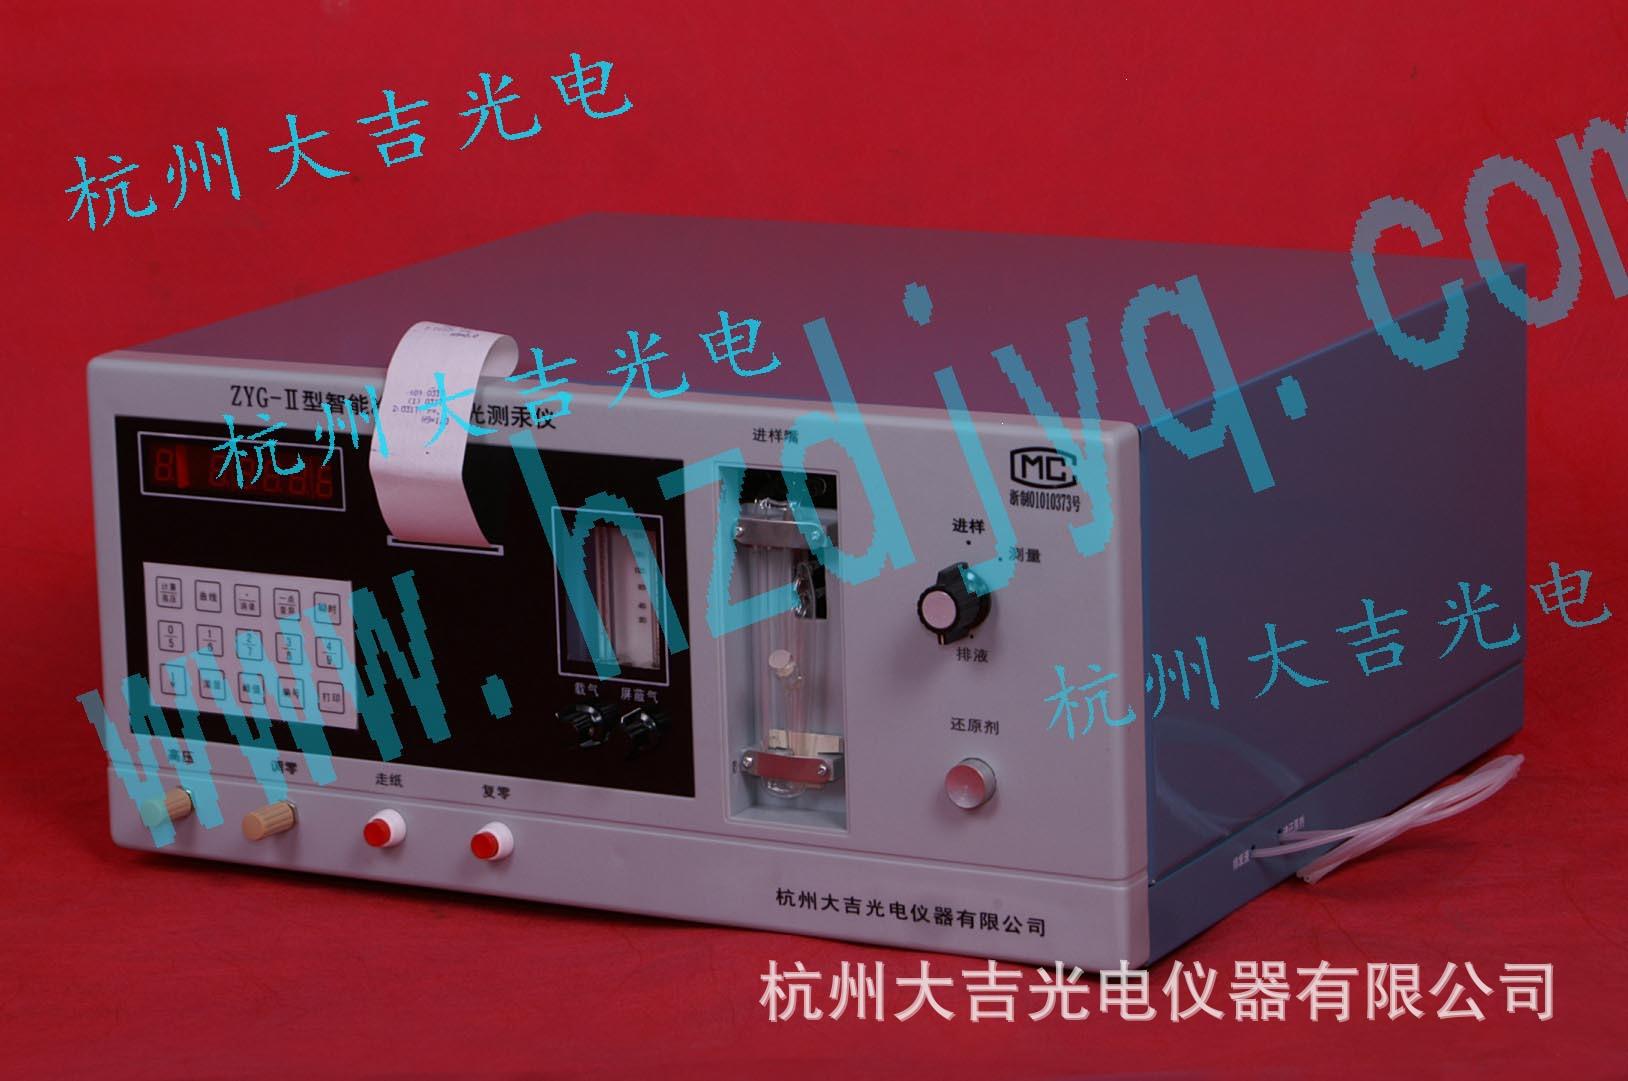 ZYG-Ⅱ智能冷原子荧光测汞仪 ZYG-Ⅱ 如说明